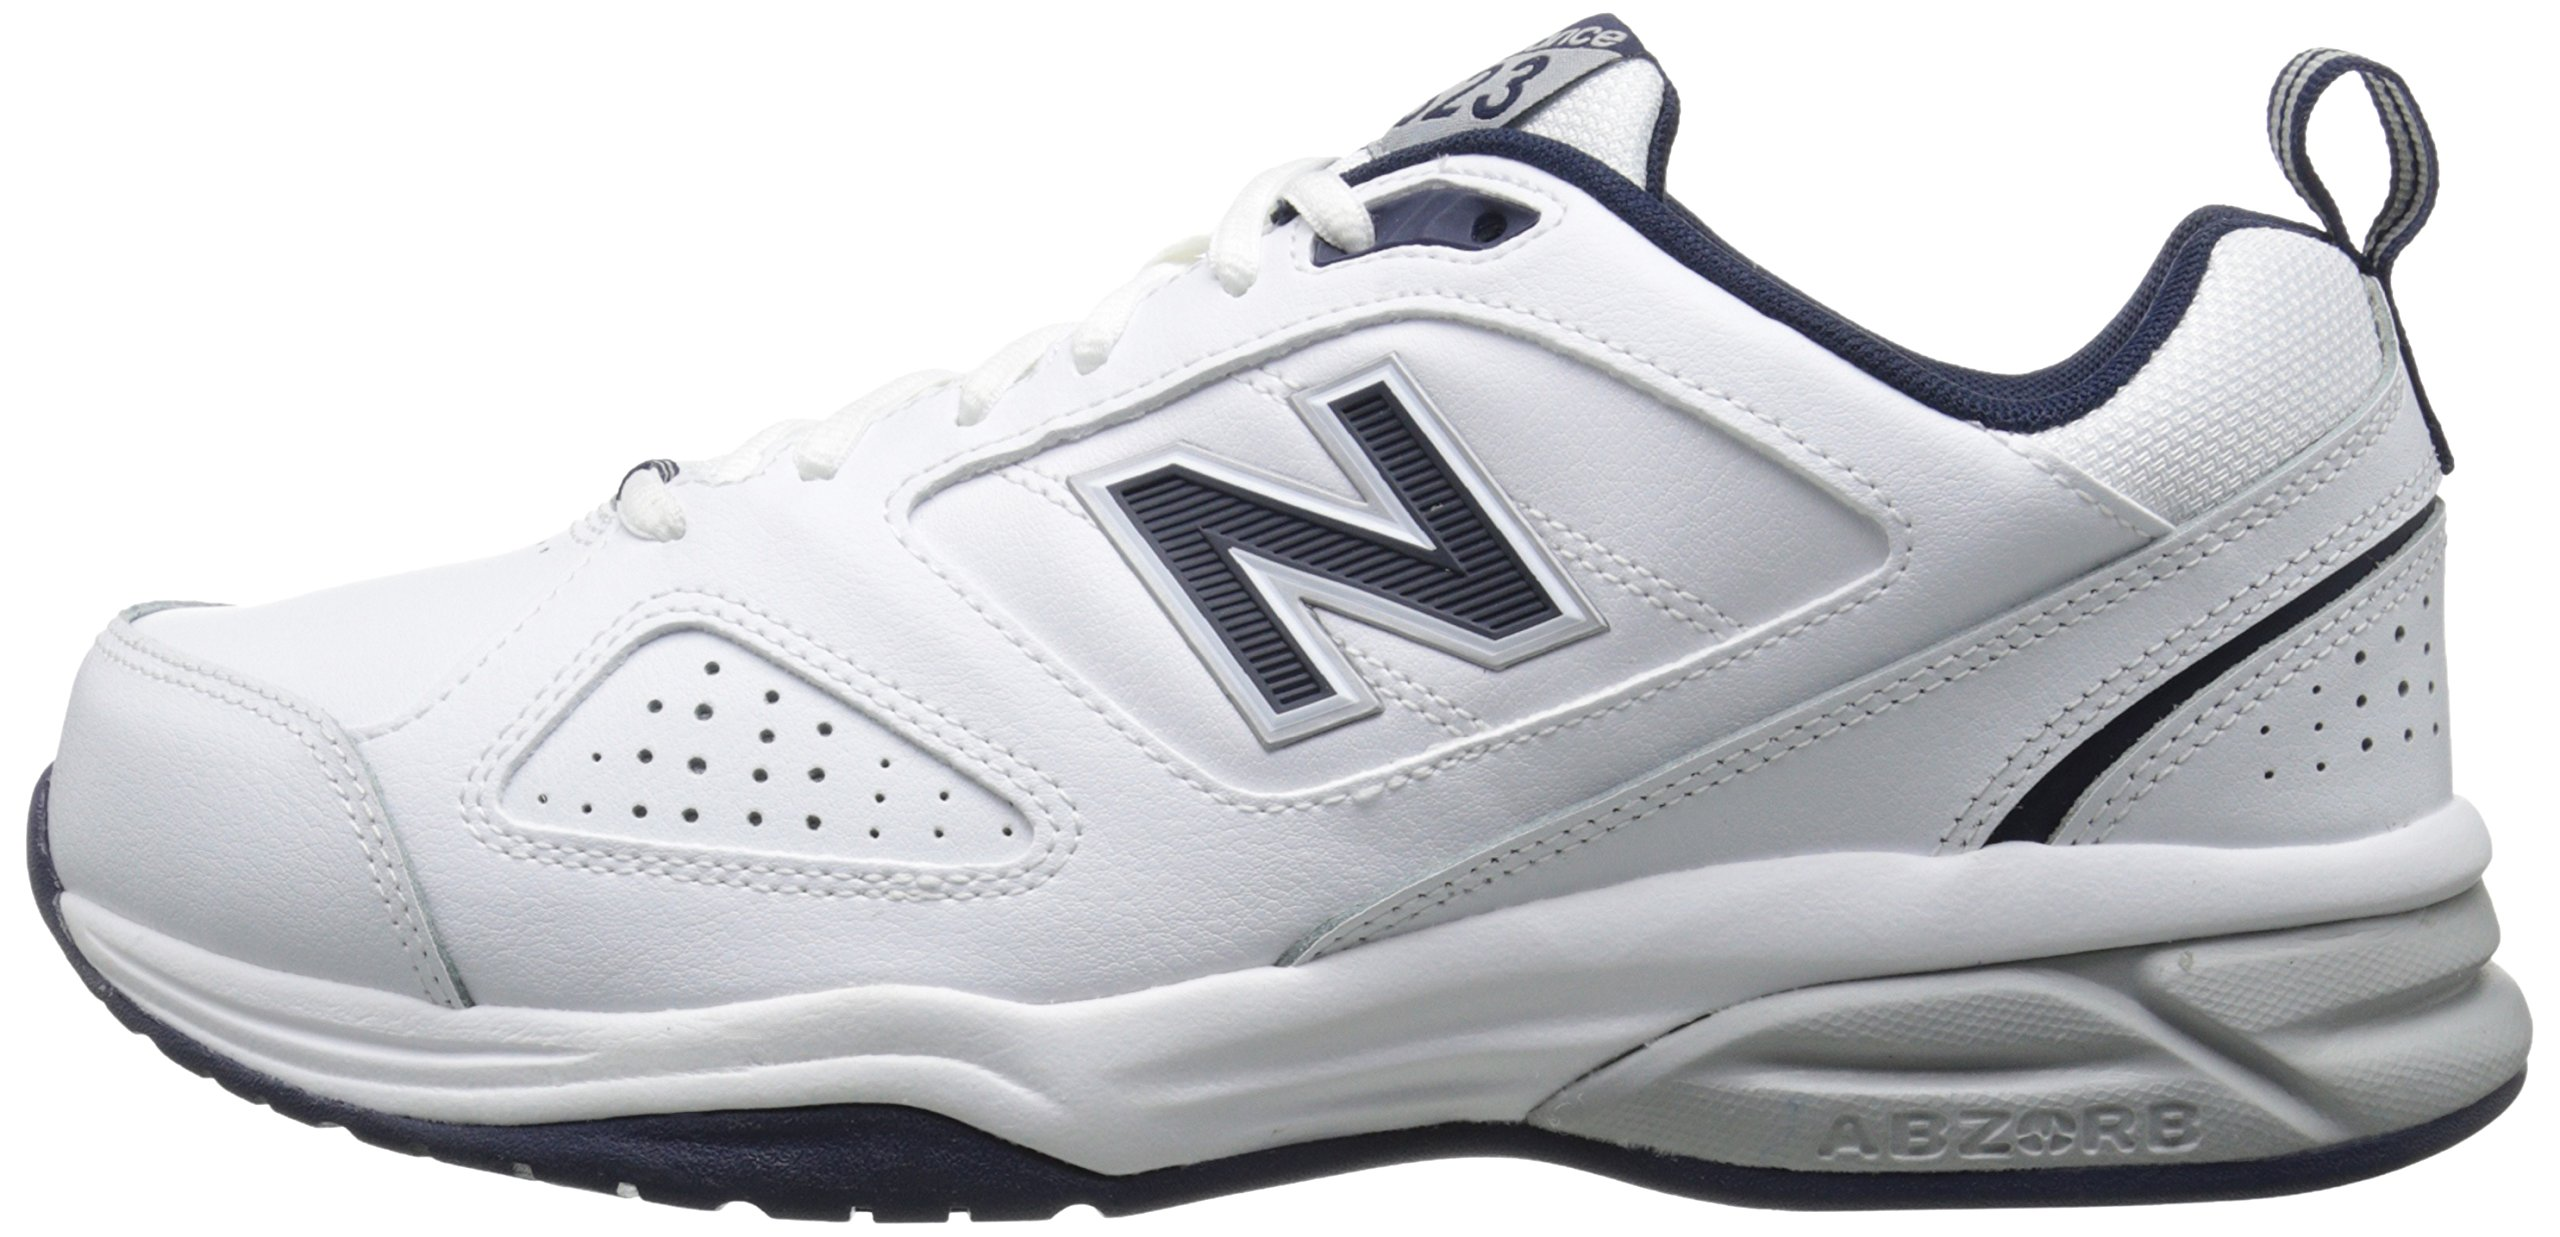 New Balance Men's MX623v3 Casual Comfort Training Shoe,  White/Navy, 8 M US by New Balance (Image #5)